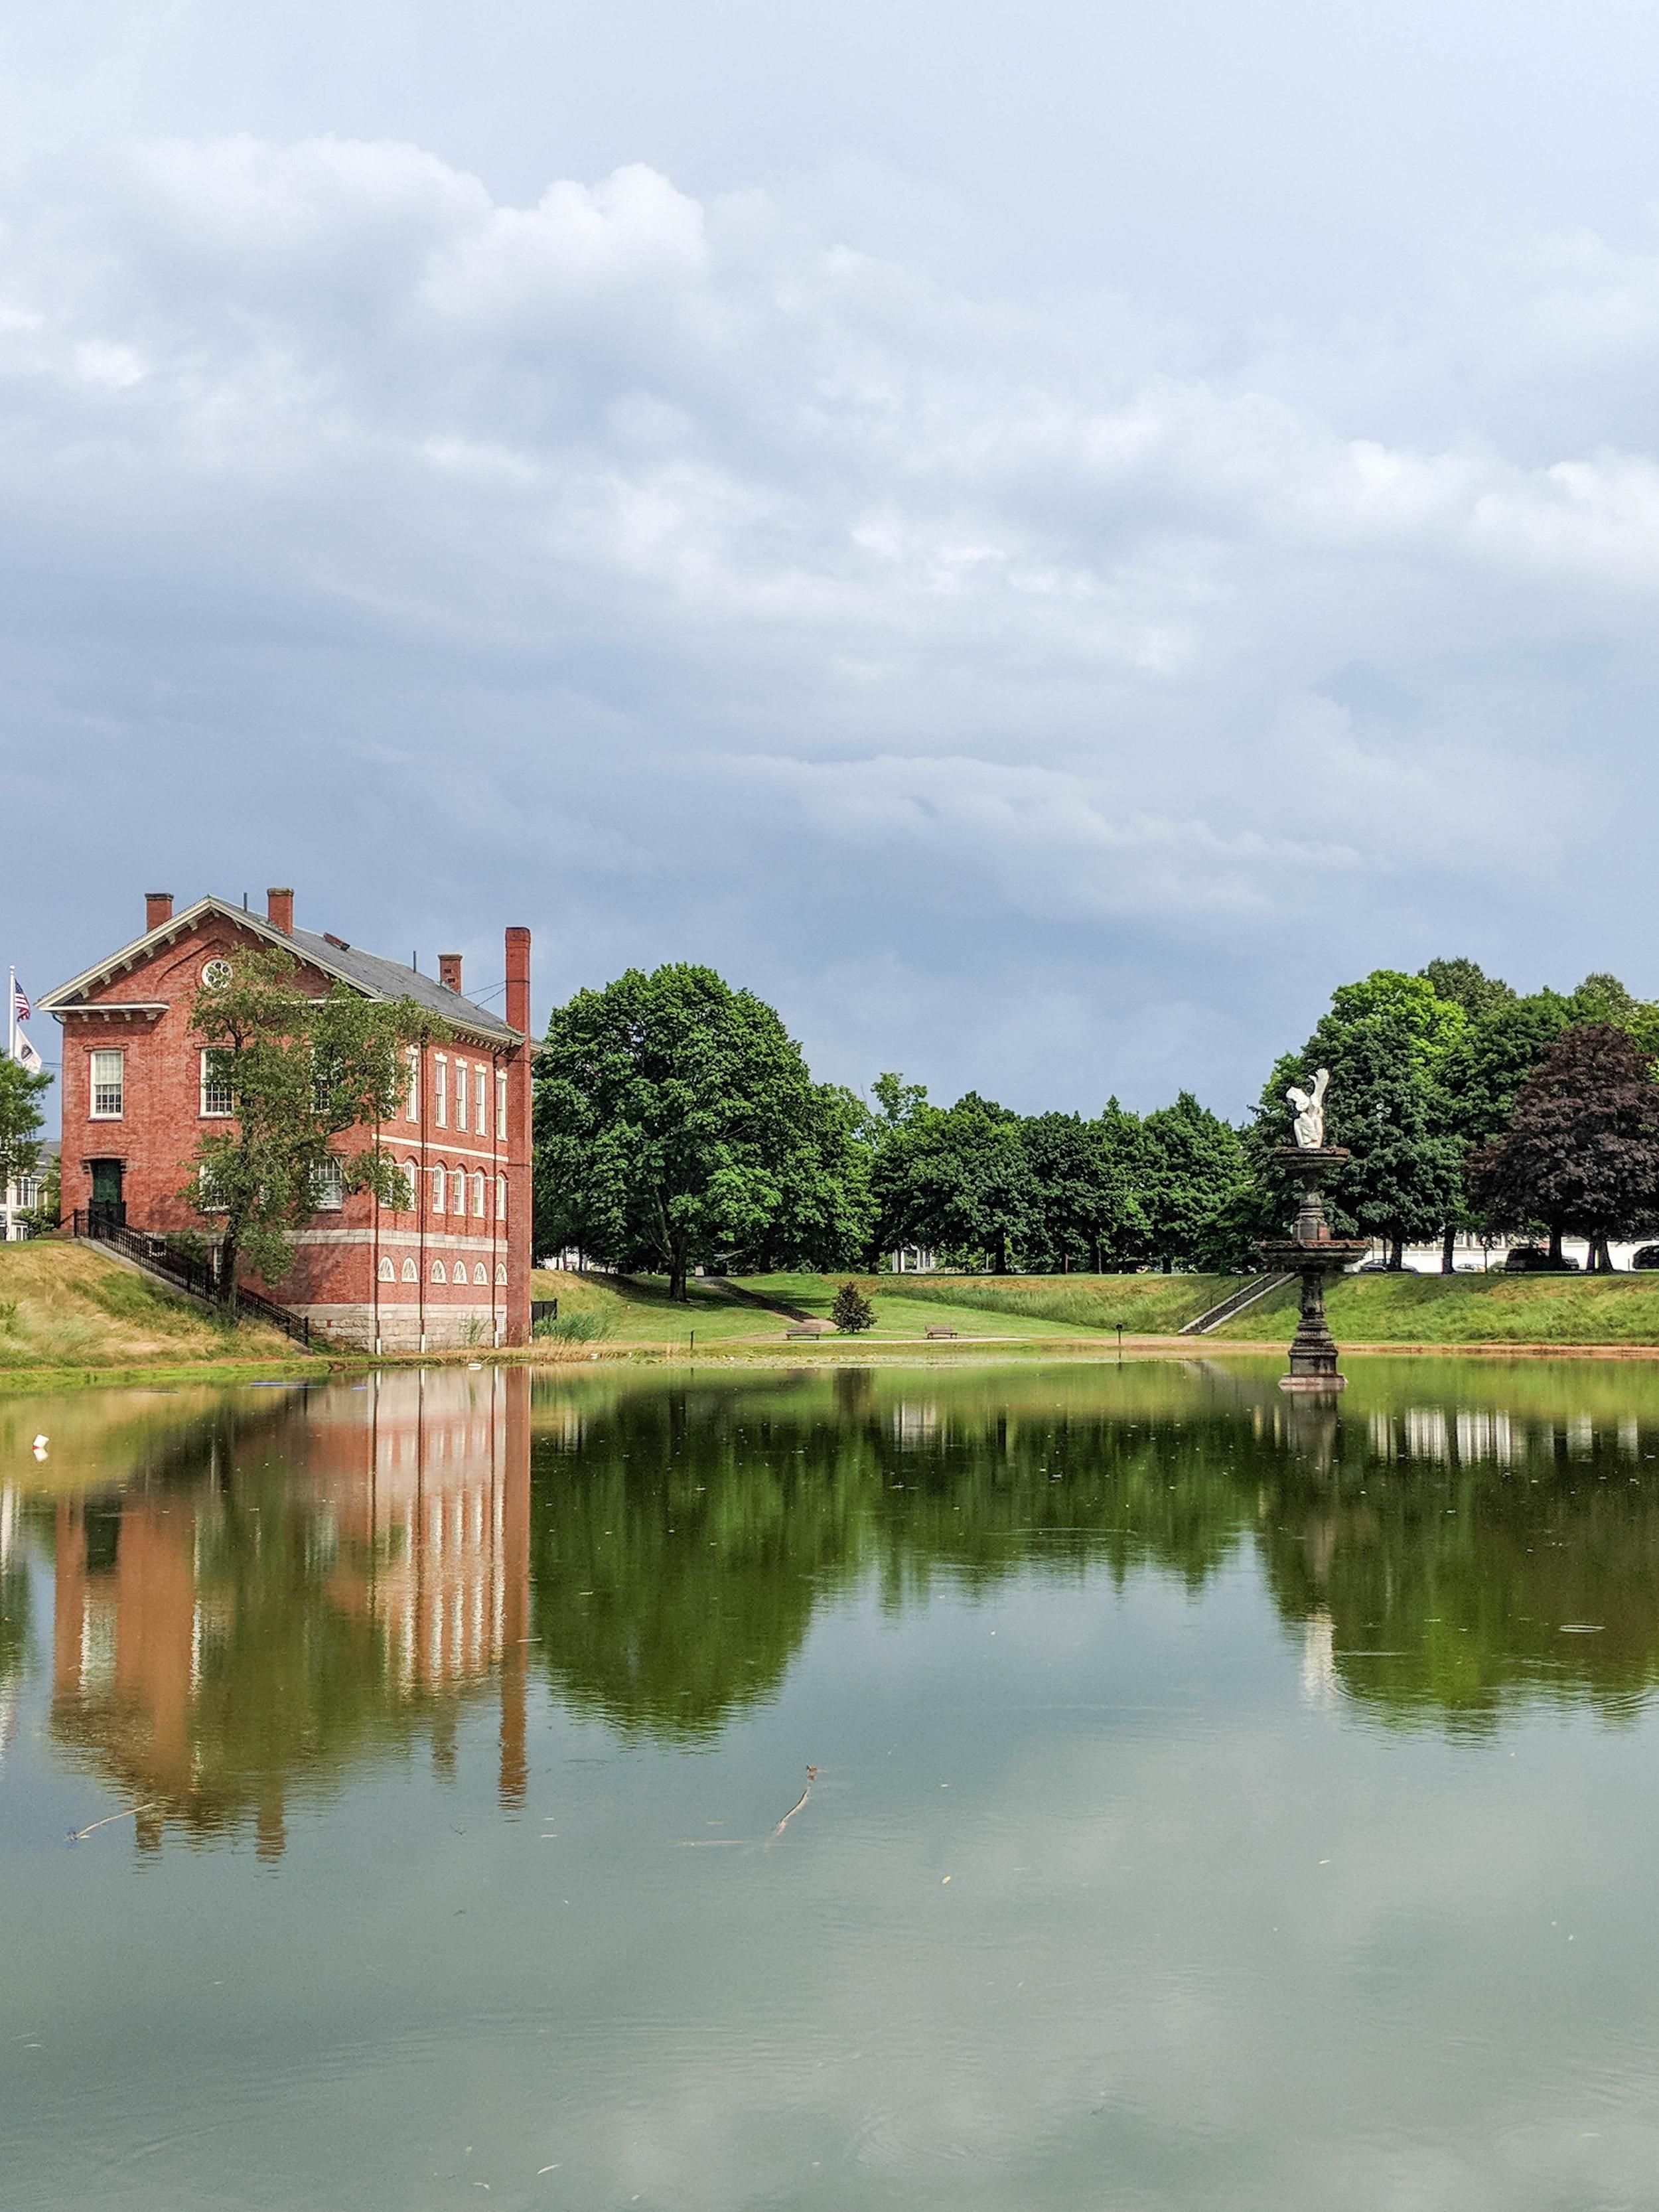 bri rinehart; newburyport; frog pond; photography